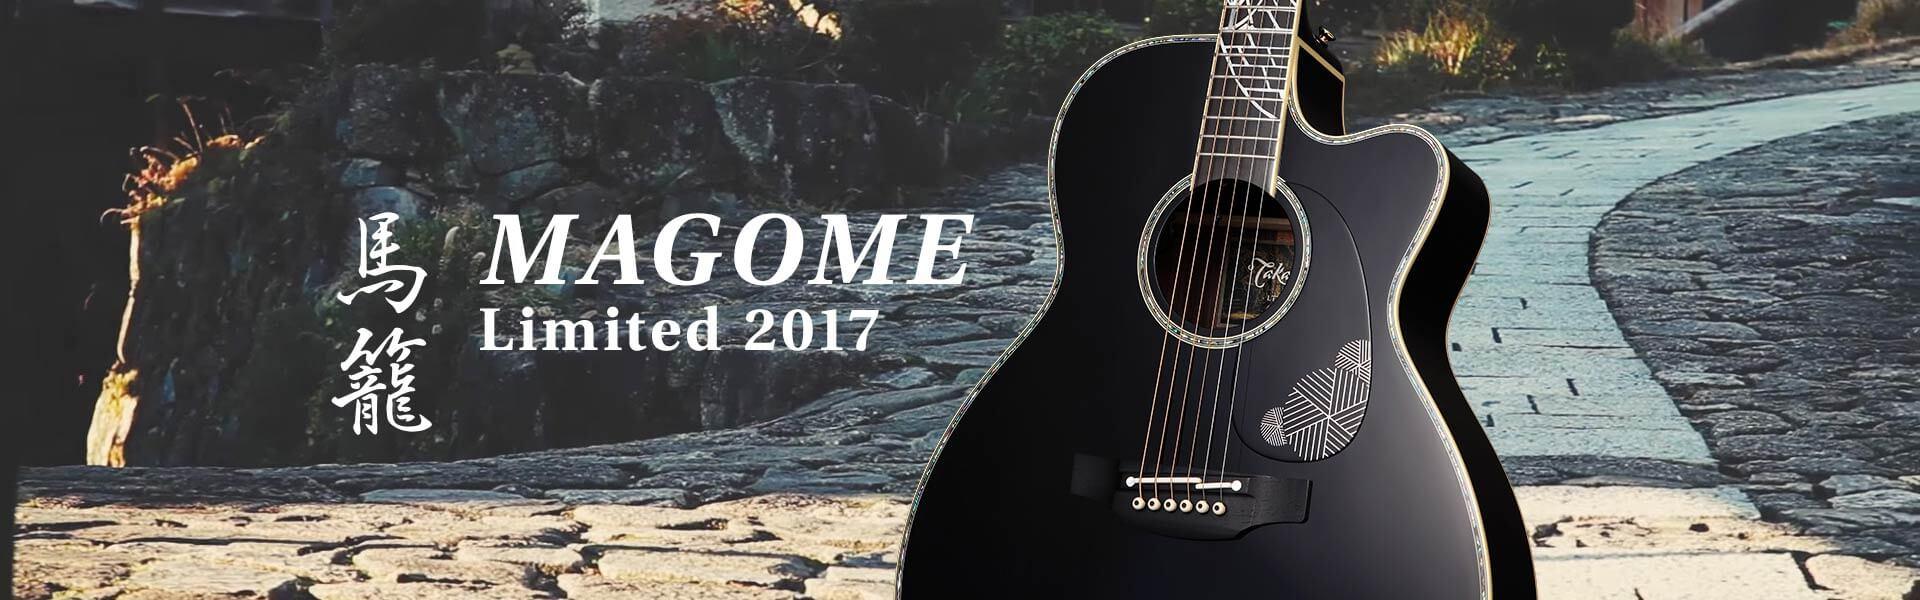 Takamine Magome 2017 Header